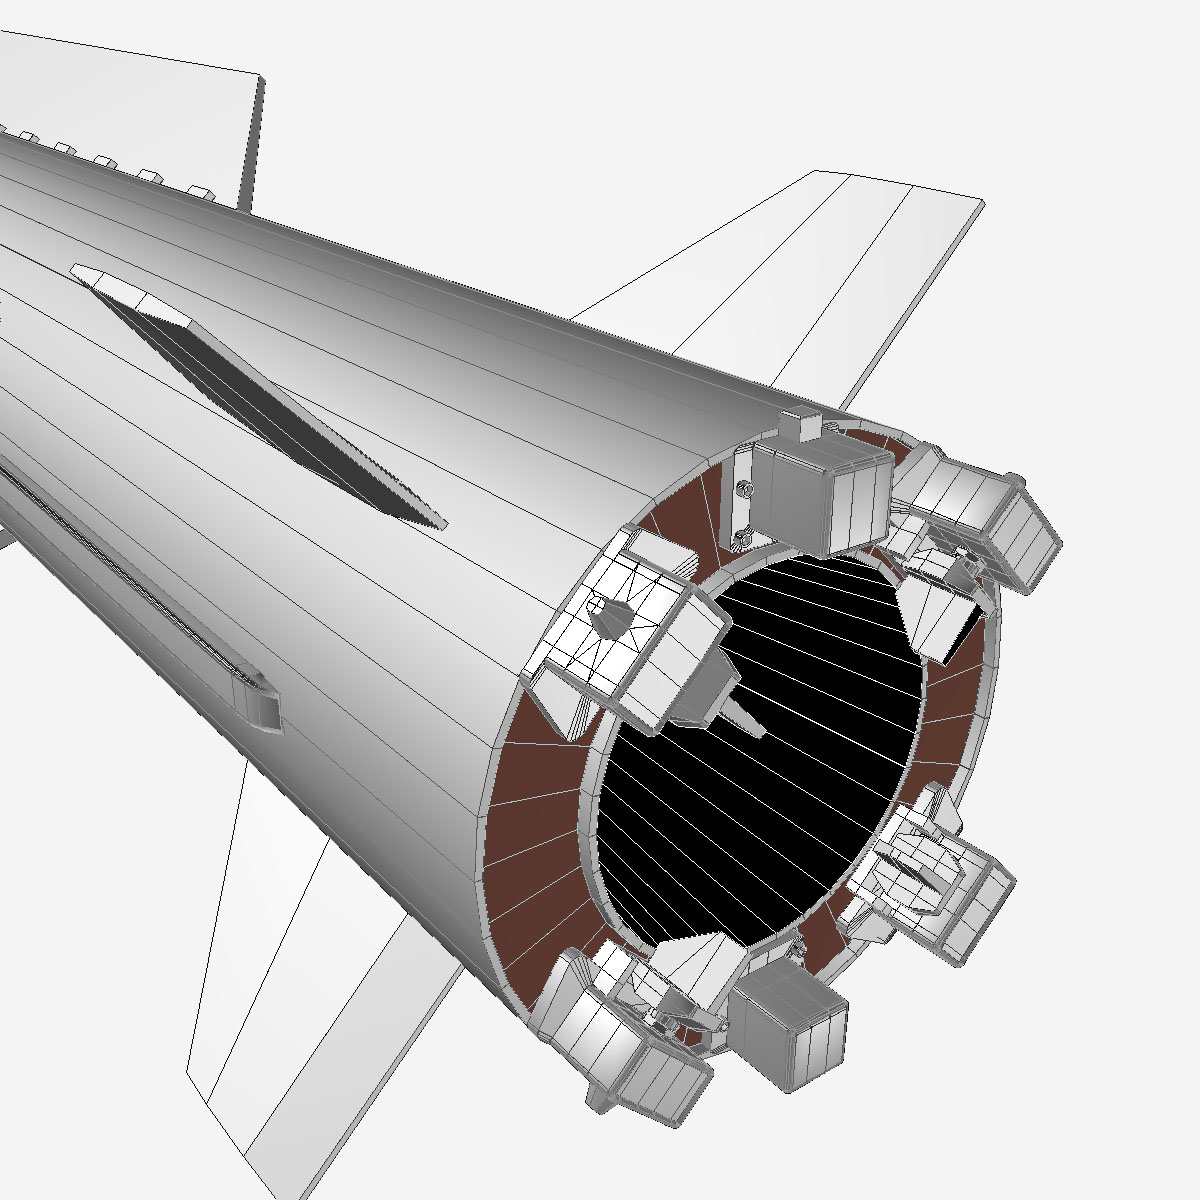 БНХАУ-ын С-400 пуужин 3d загвар 3ds dxf cob x obj 157969